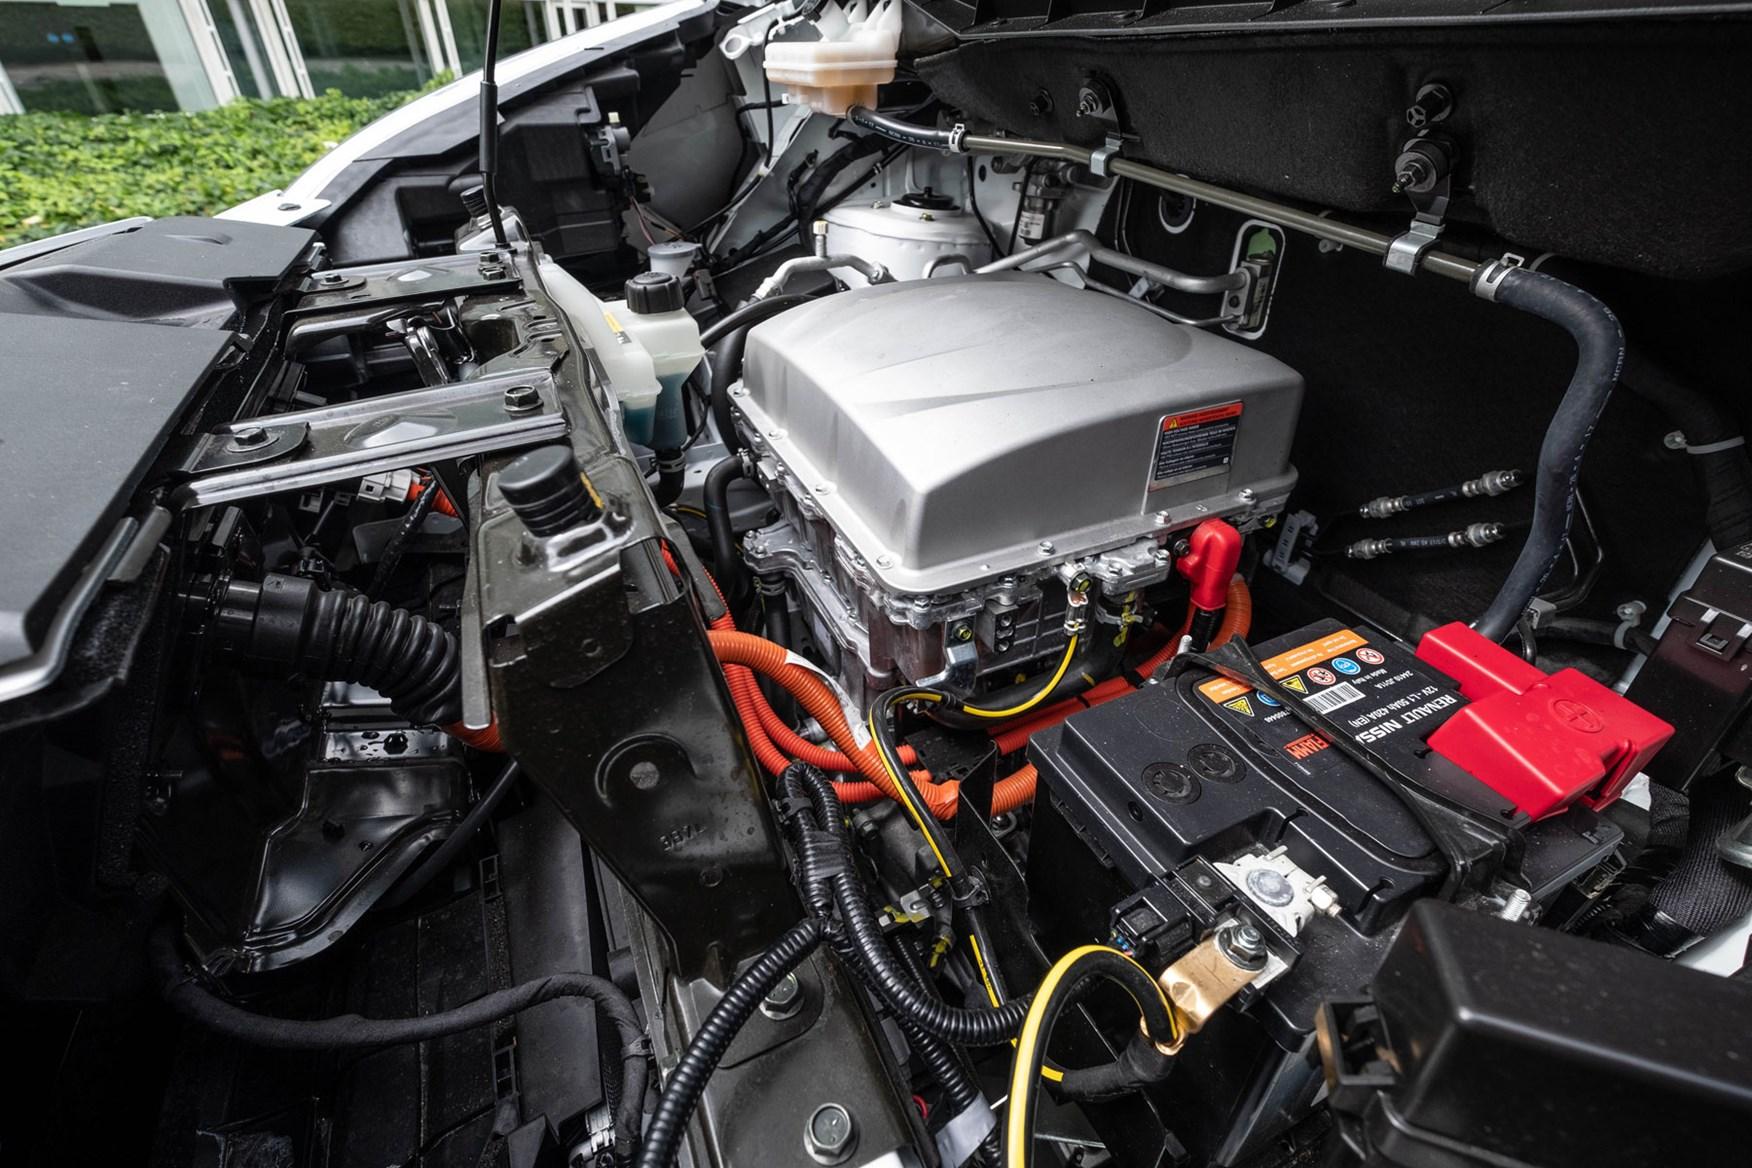 Nissan e-NV200 2018 electric van review - 60% more driving range